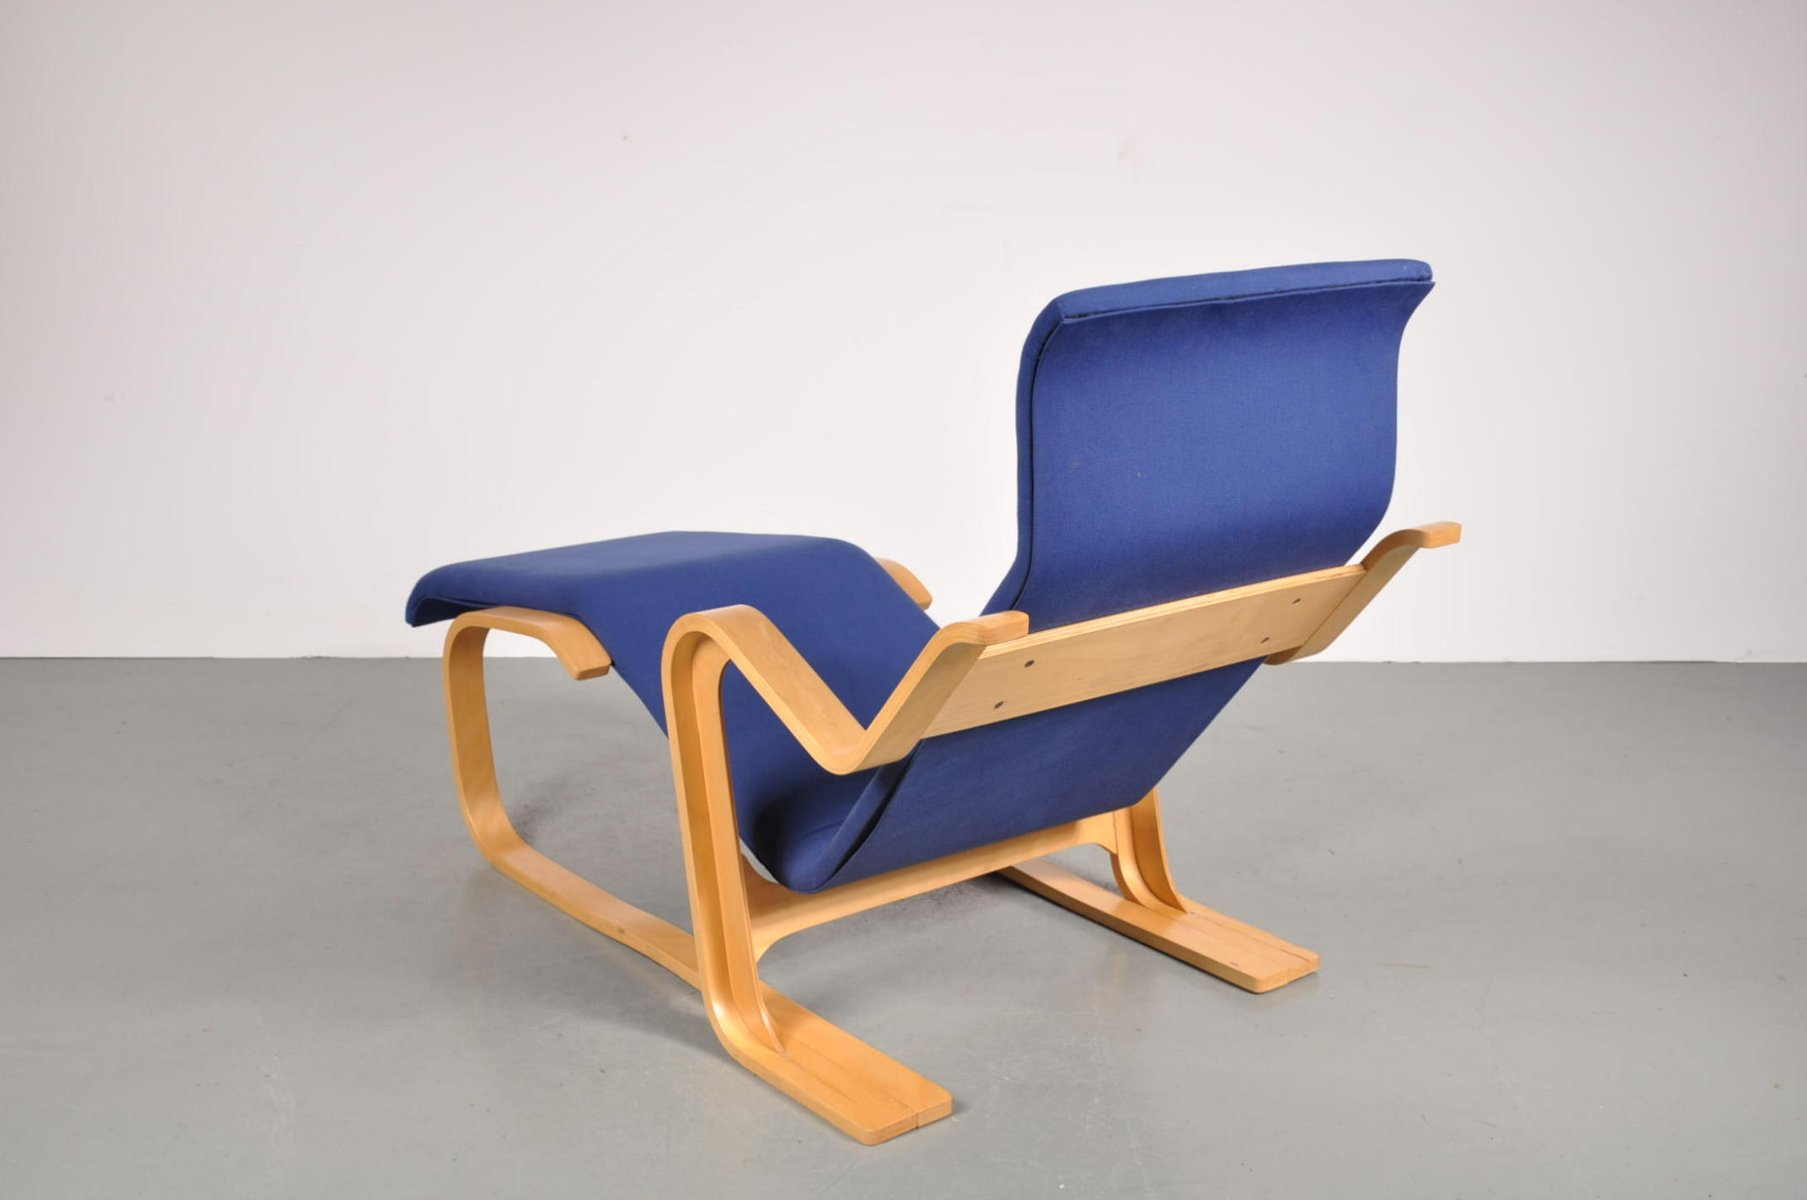 birkenholz lounge stuhl von marcel breuer f r gavina bei pamono kaufen. Black Bedroom Furniture Sets. Home Design Ideas